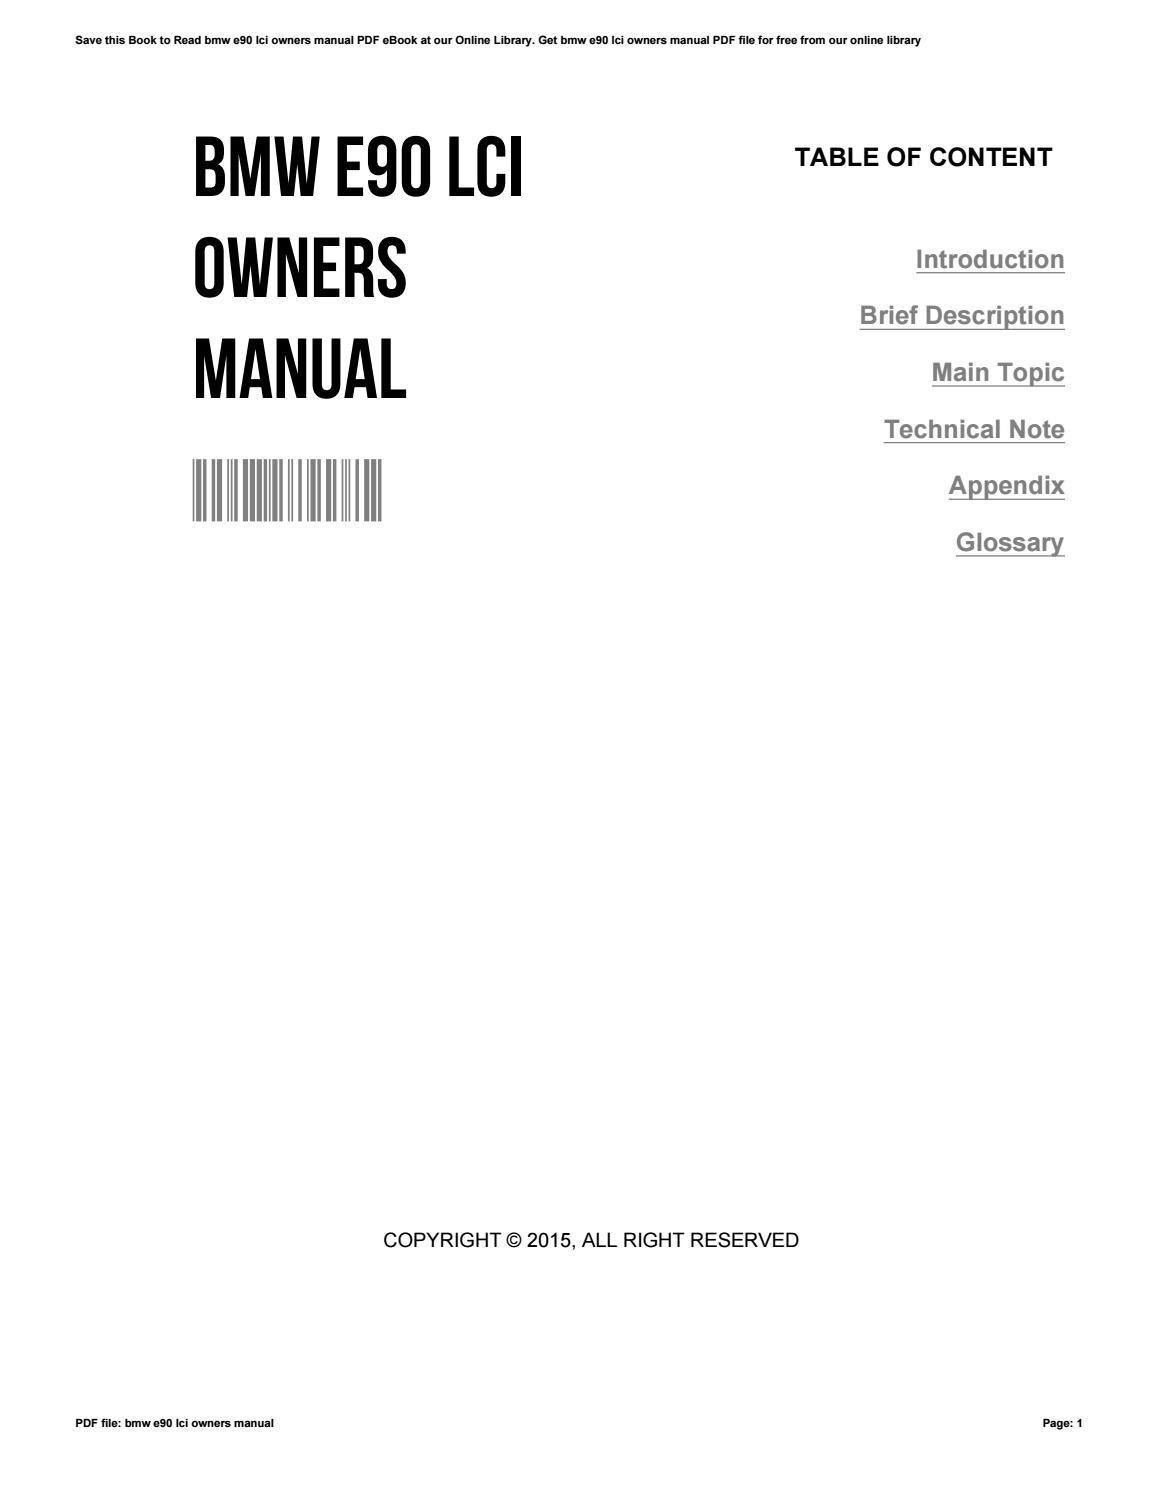 e90 lci owners manual